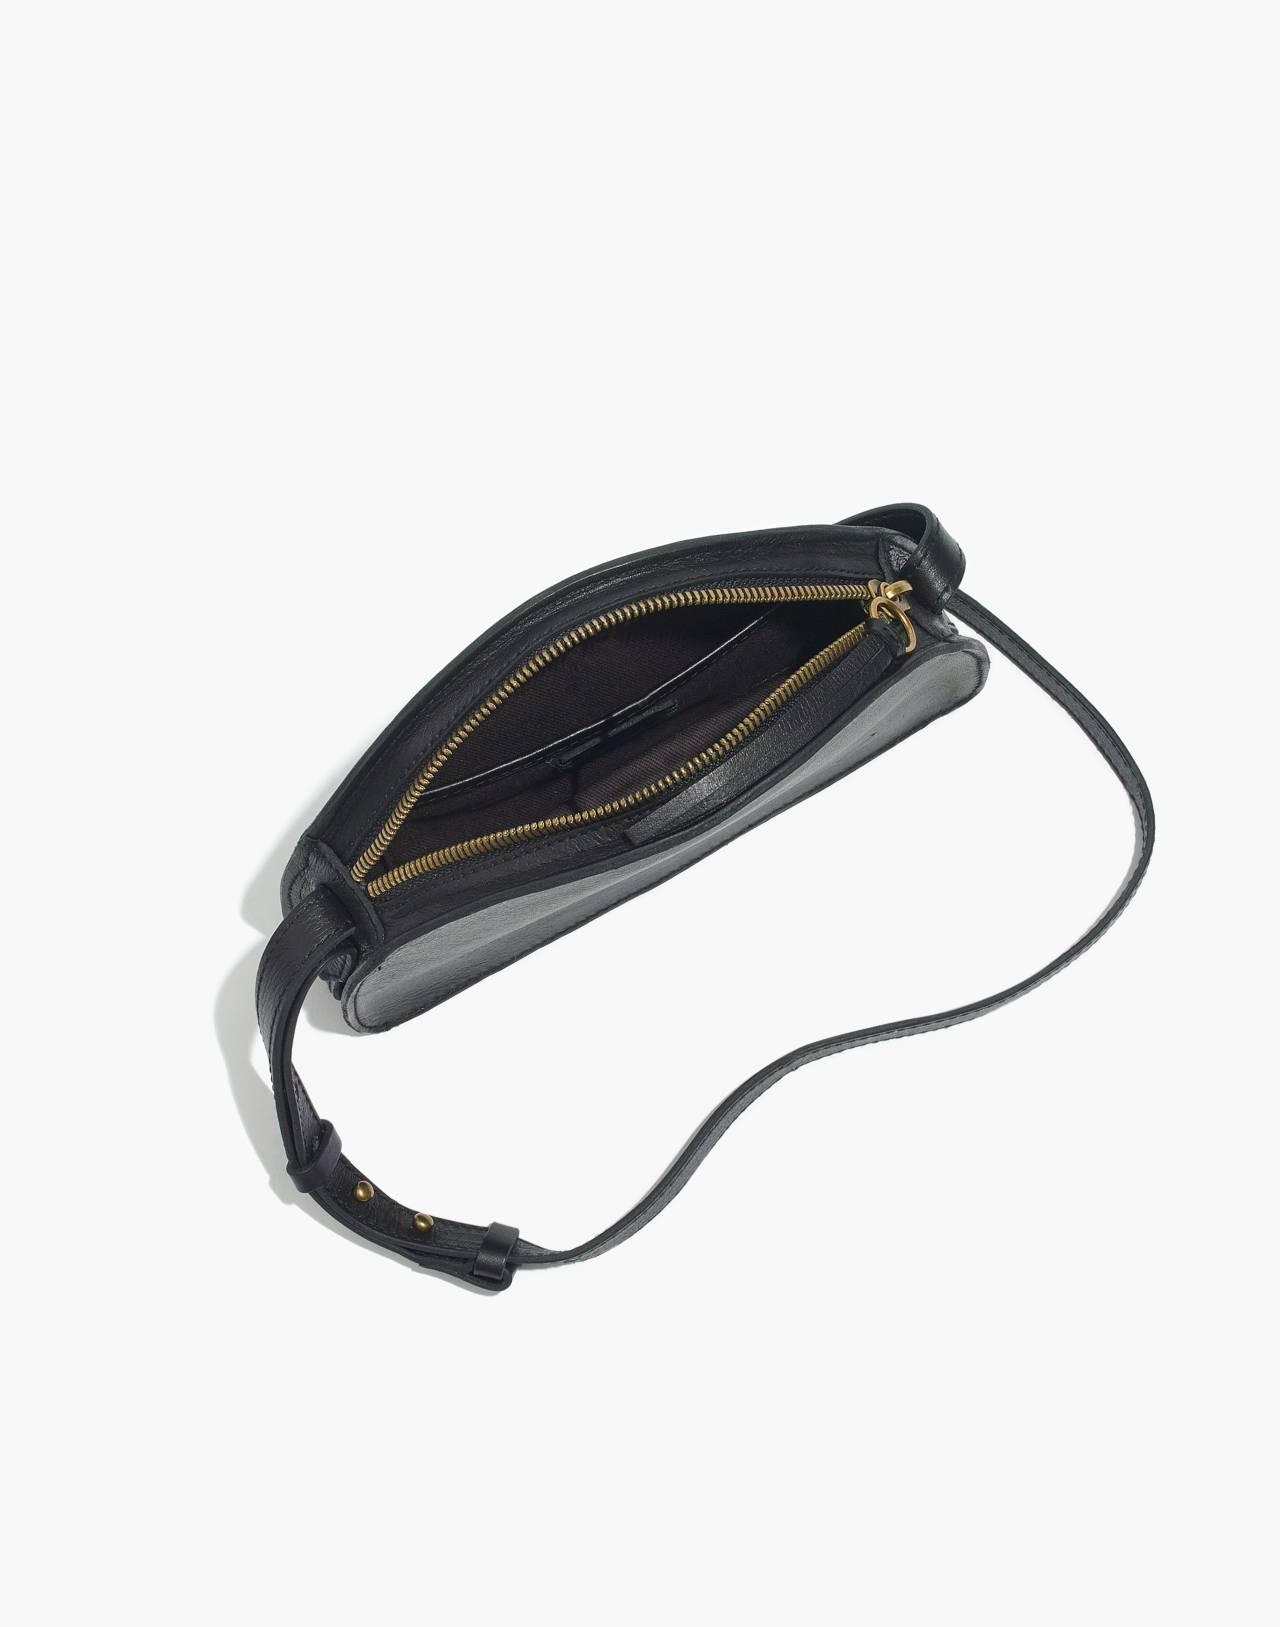 The Simple Half-Moon Crossbody Bag in true black image 2